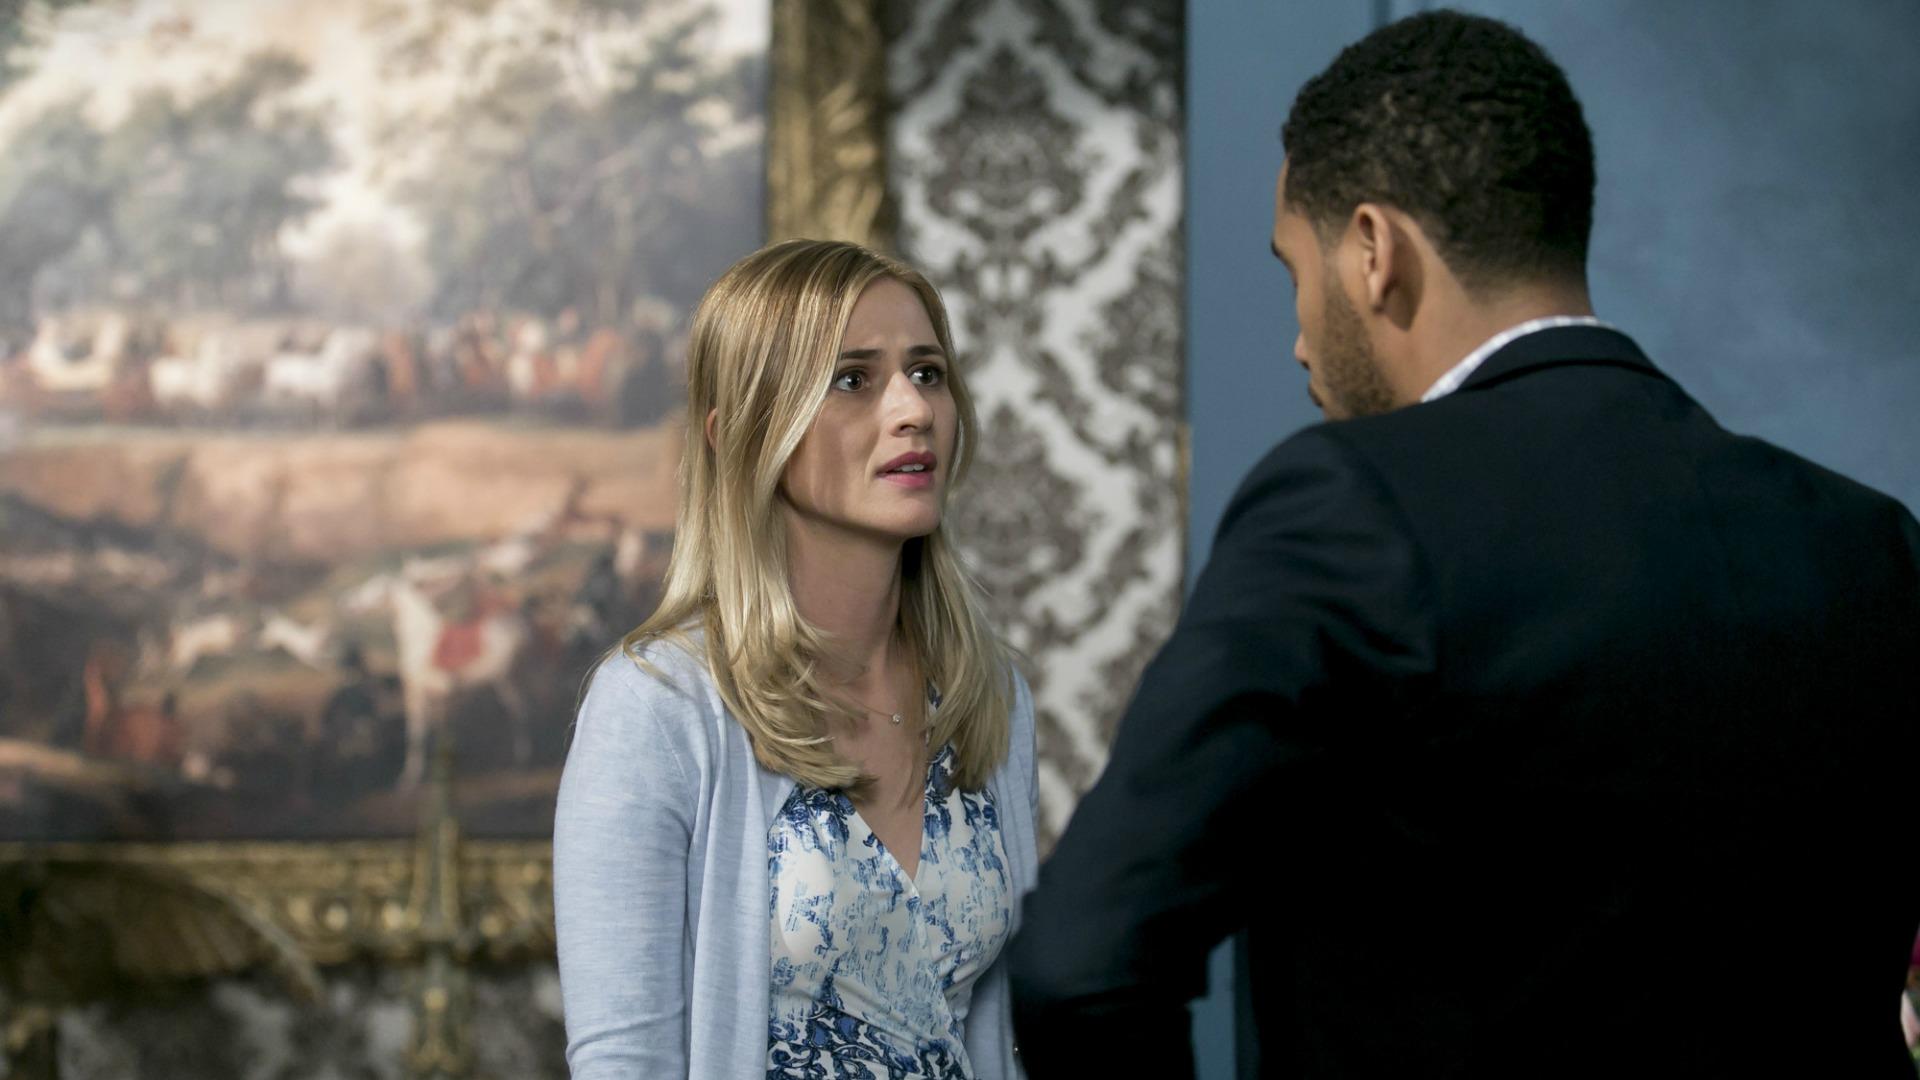 Tessa and Brady have a tense conversation.